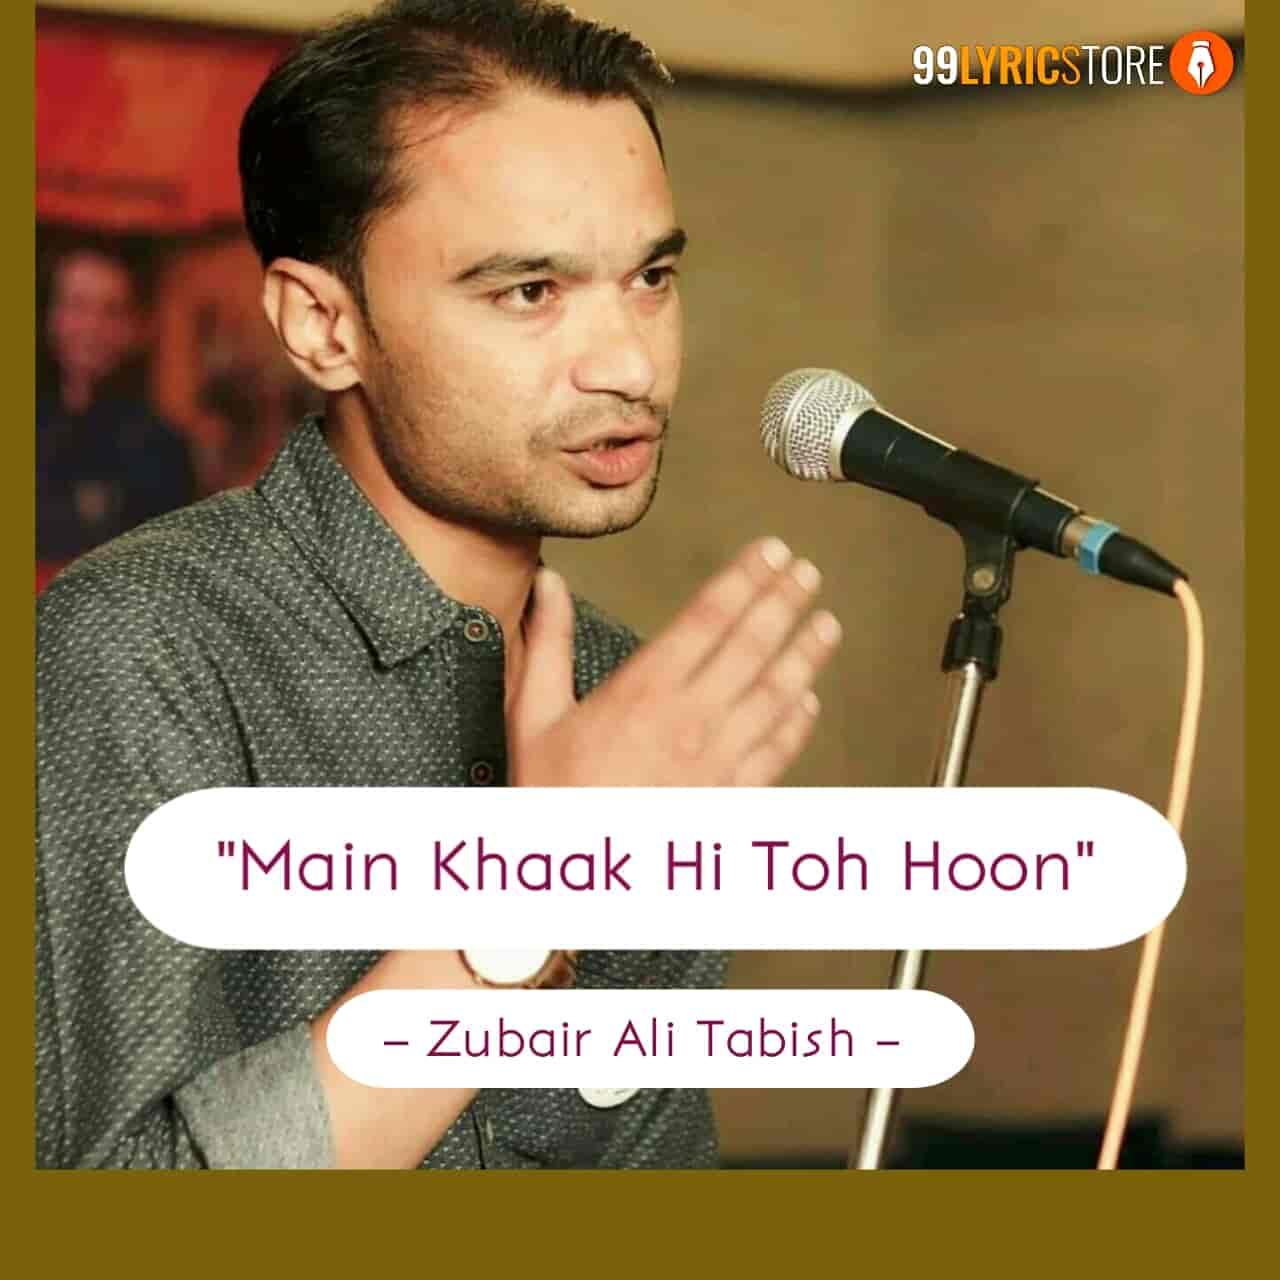 This Beautiful Poetry 'Main Khaak Hi Toh Hoon' has written and performed by Zubair Ali Tabish on Jashn-e-Urdu.